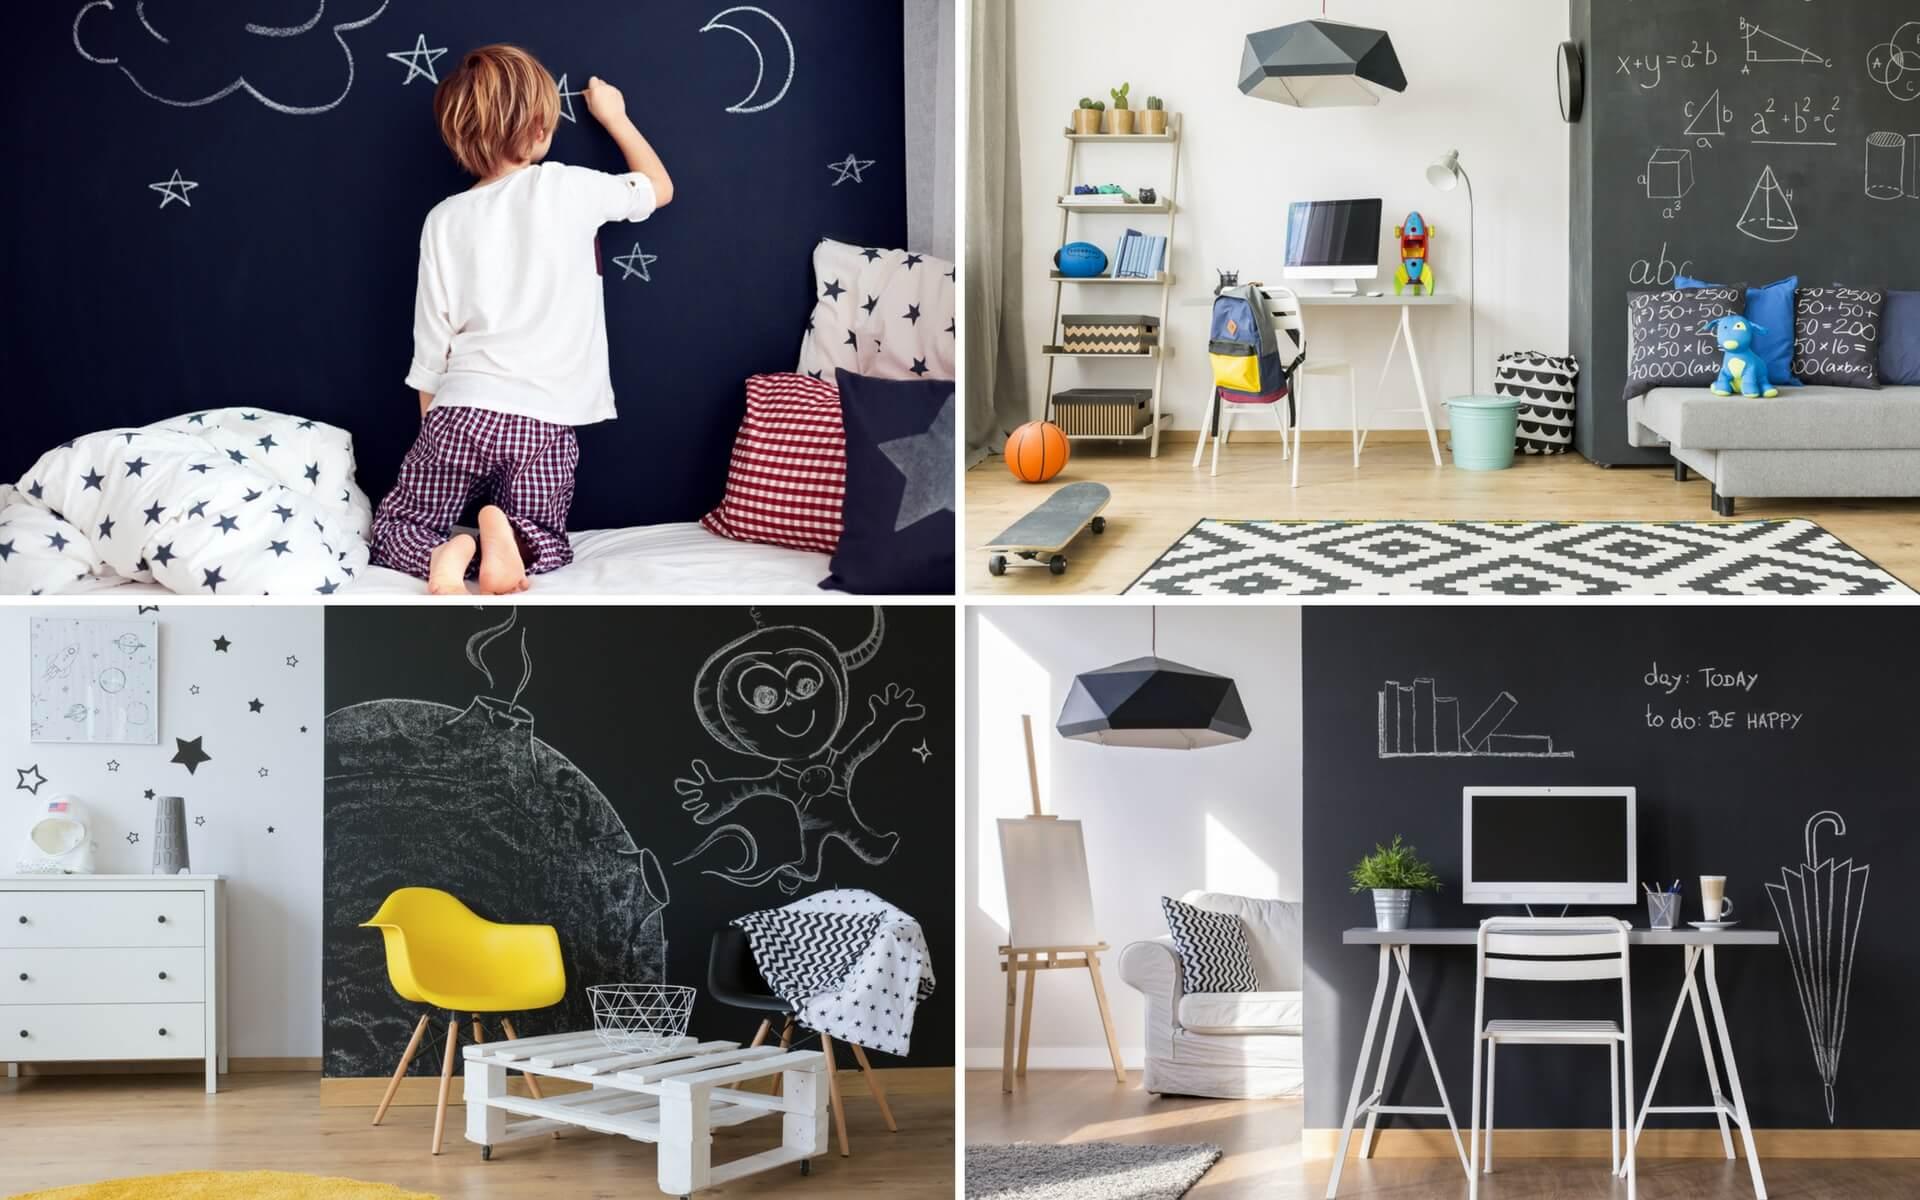 Idee Pittura Cameretta Bambina decorare le pareti con vernice lavagna | blog oknoplast